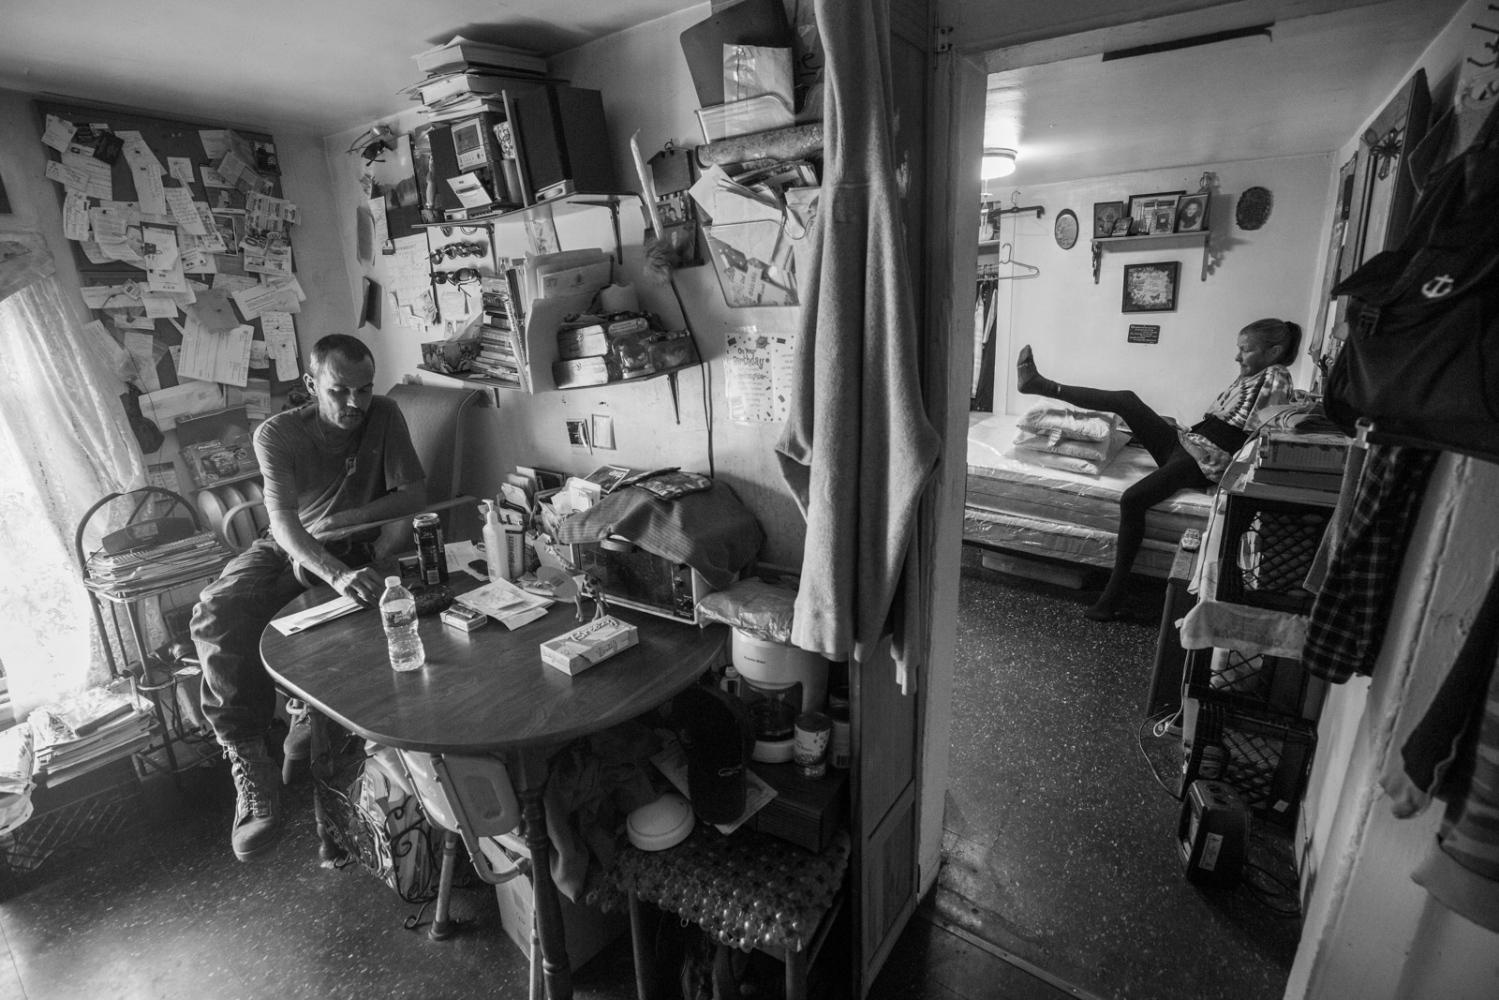 Art and Documentary Photography - Loading 36_HomeoftheBrave.jpg